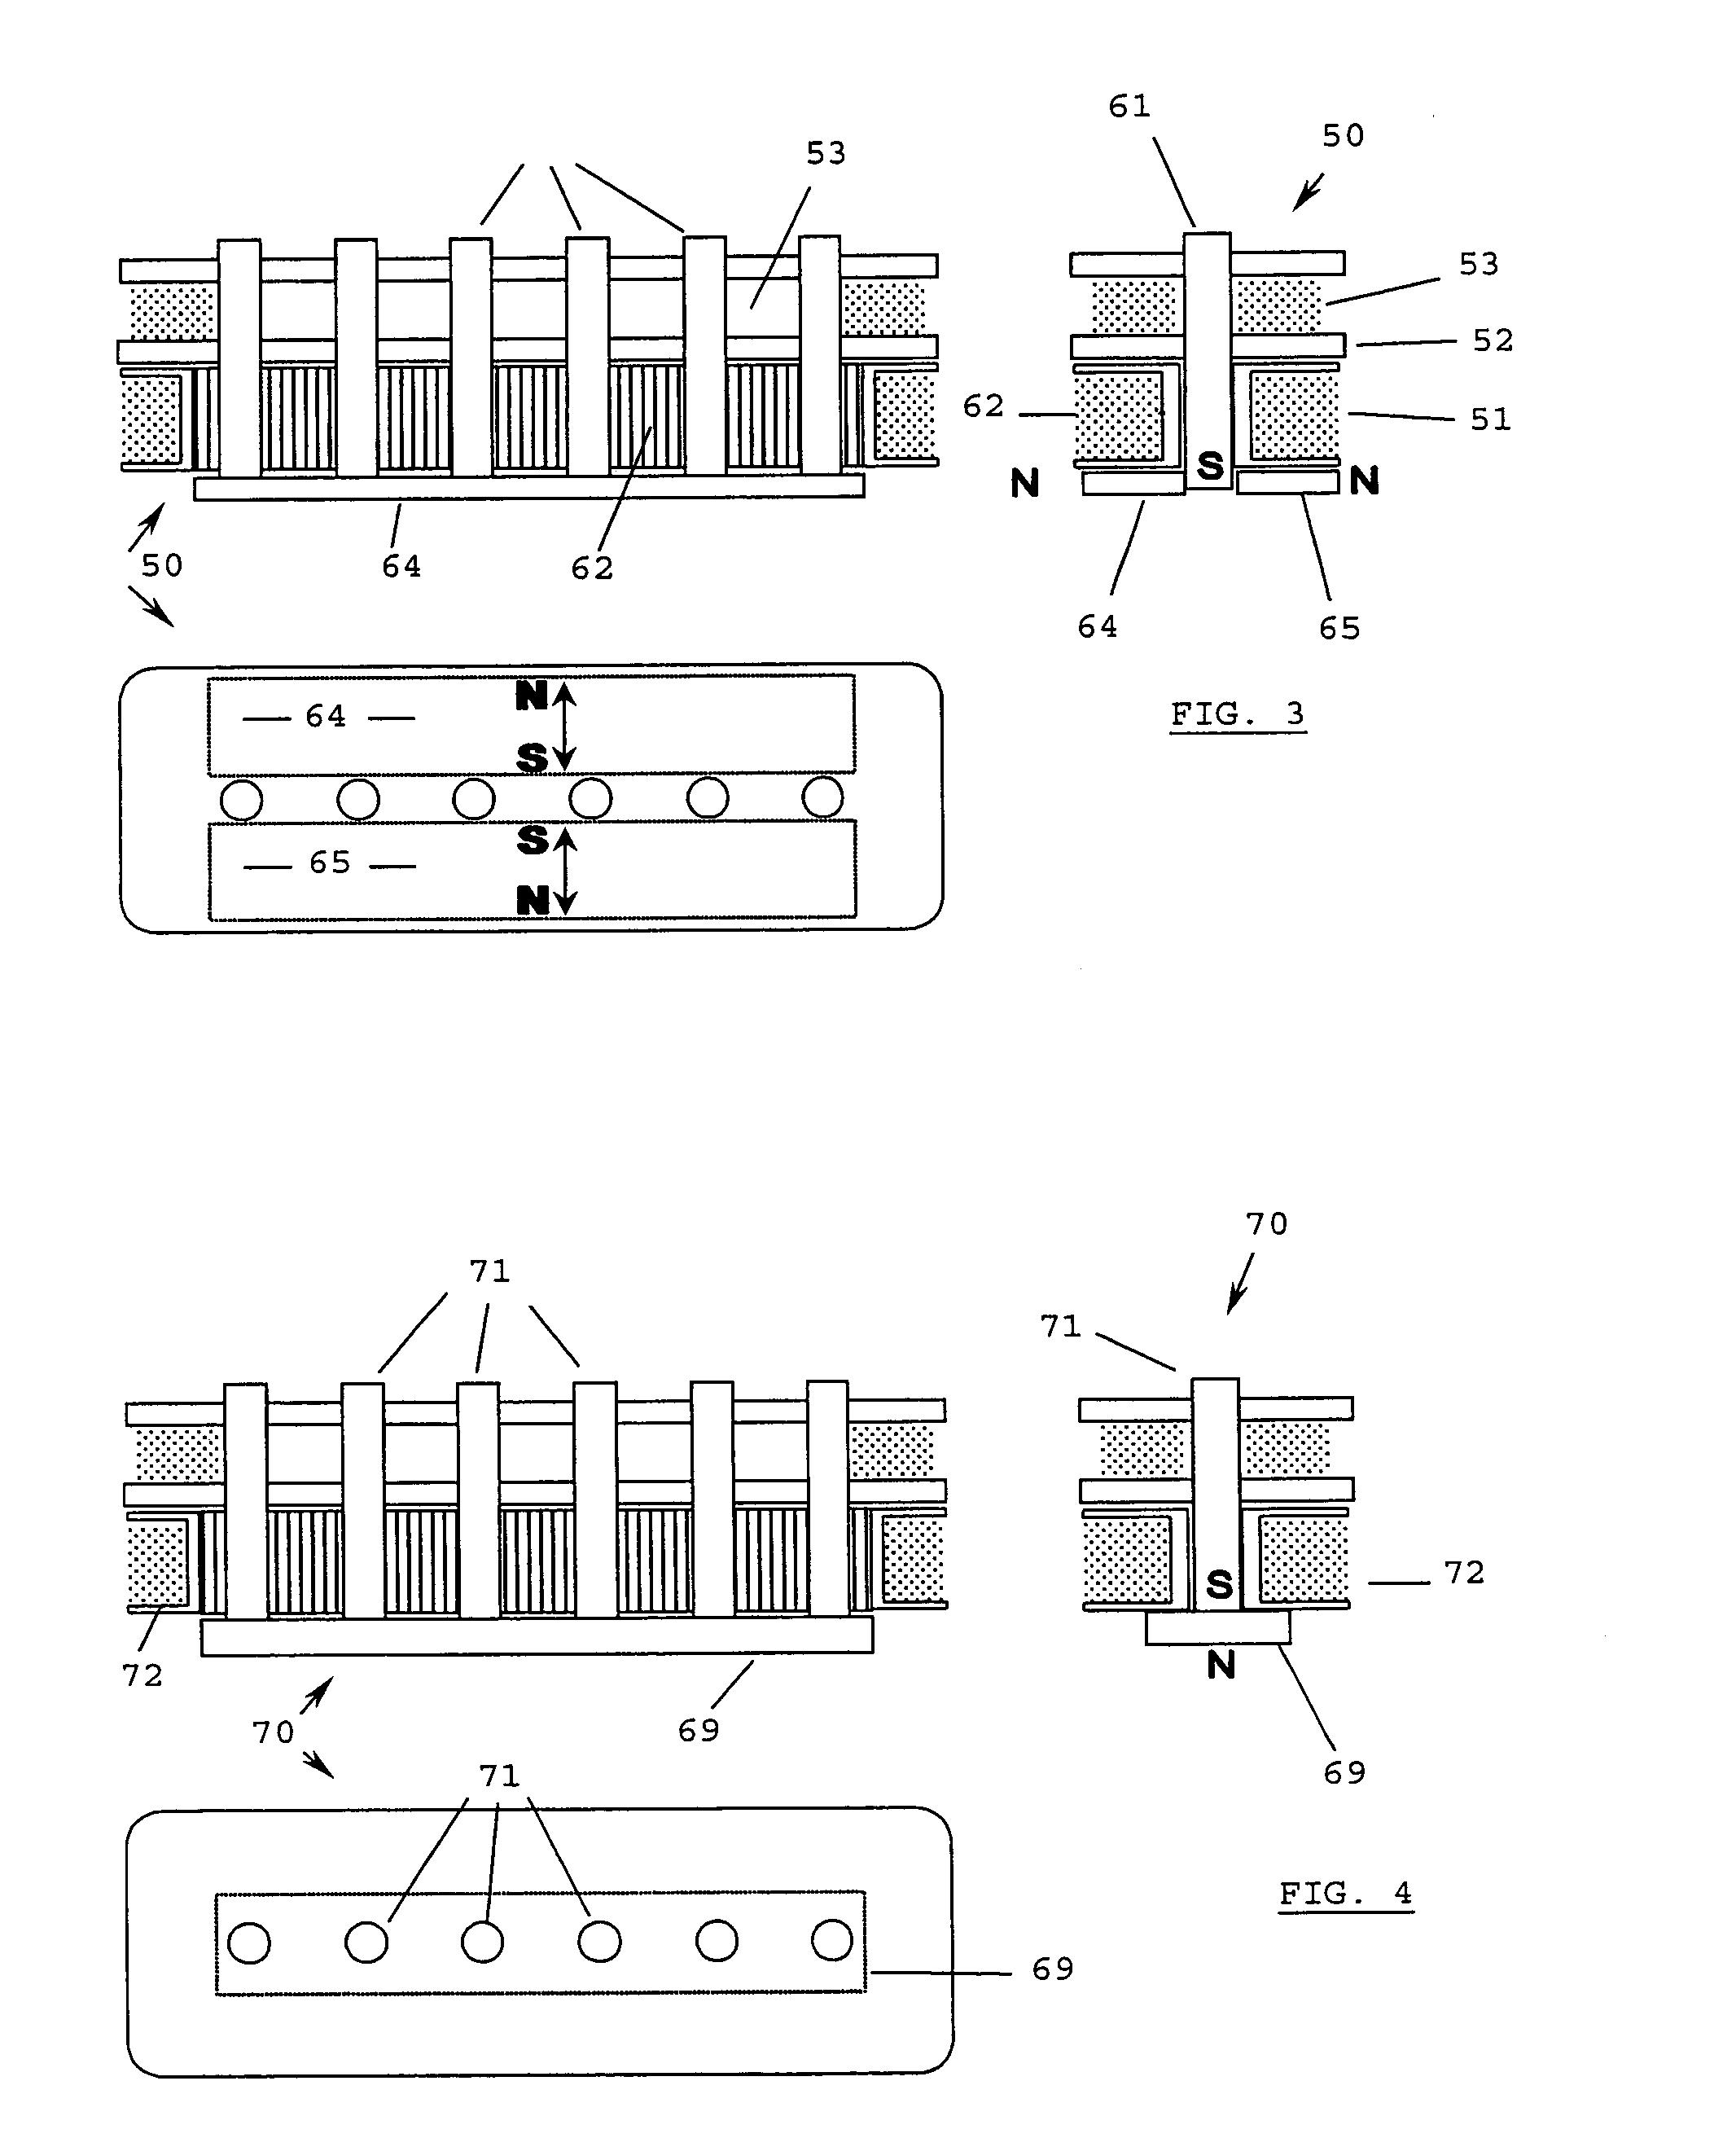 patent drawing - Symmons Temptrol